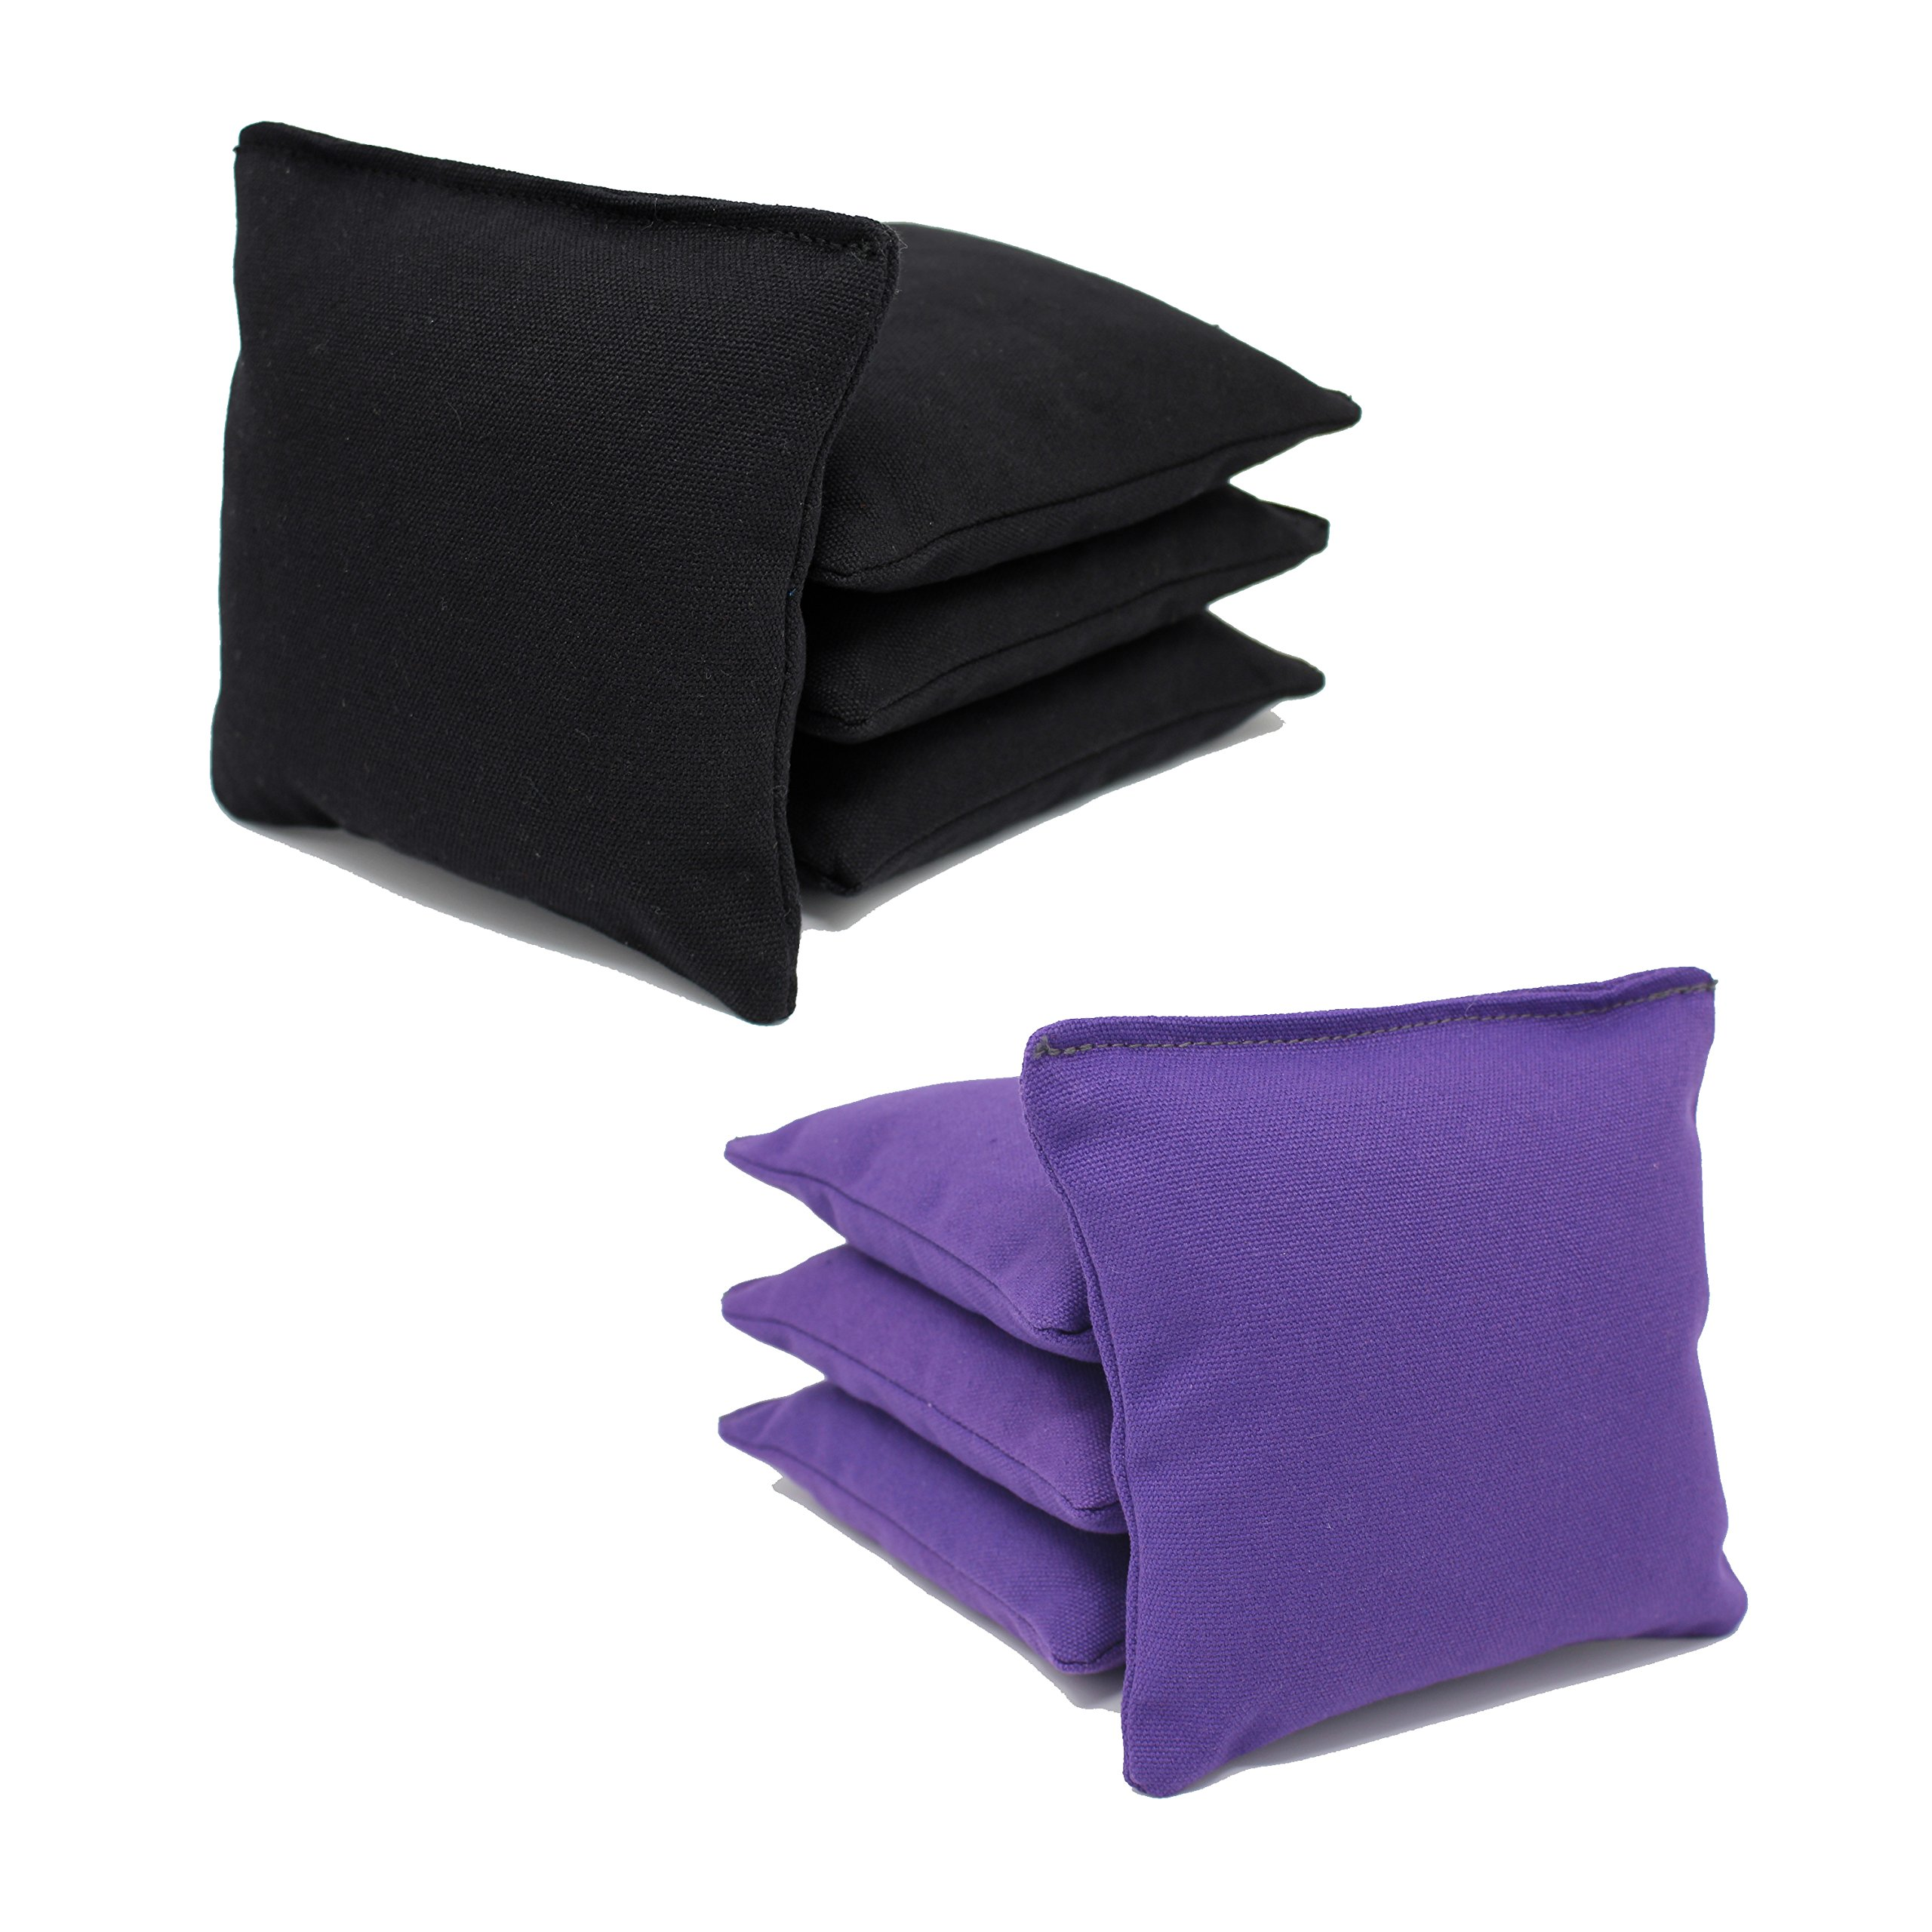 Free Donkey Sports Cornhole Bags (Pack of 8), Black/Purple, Regular by Free Donkey Sports